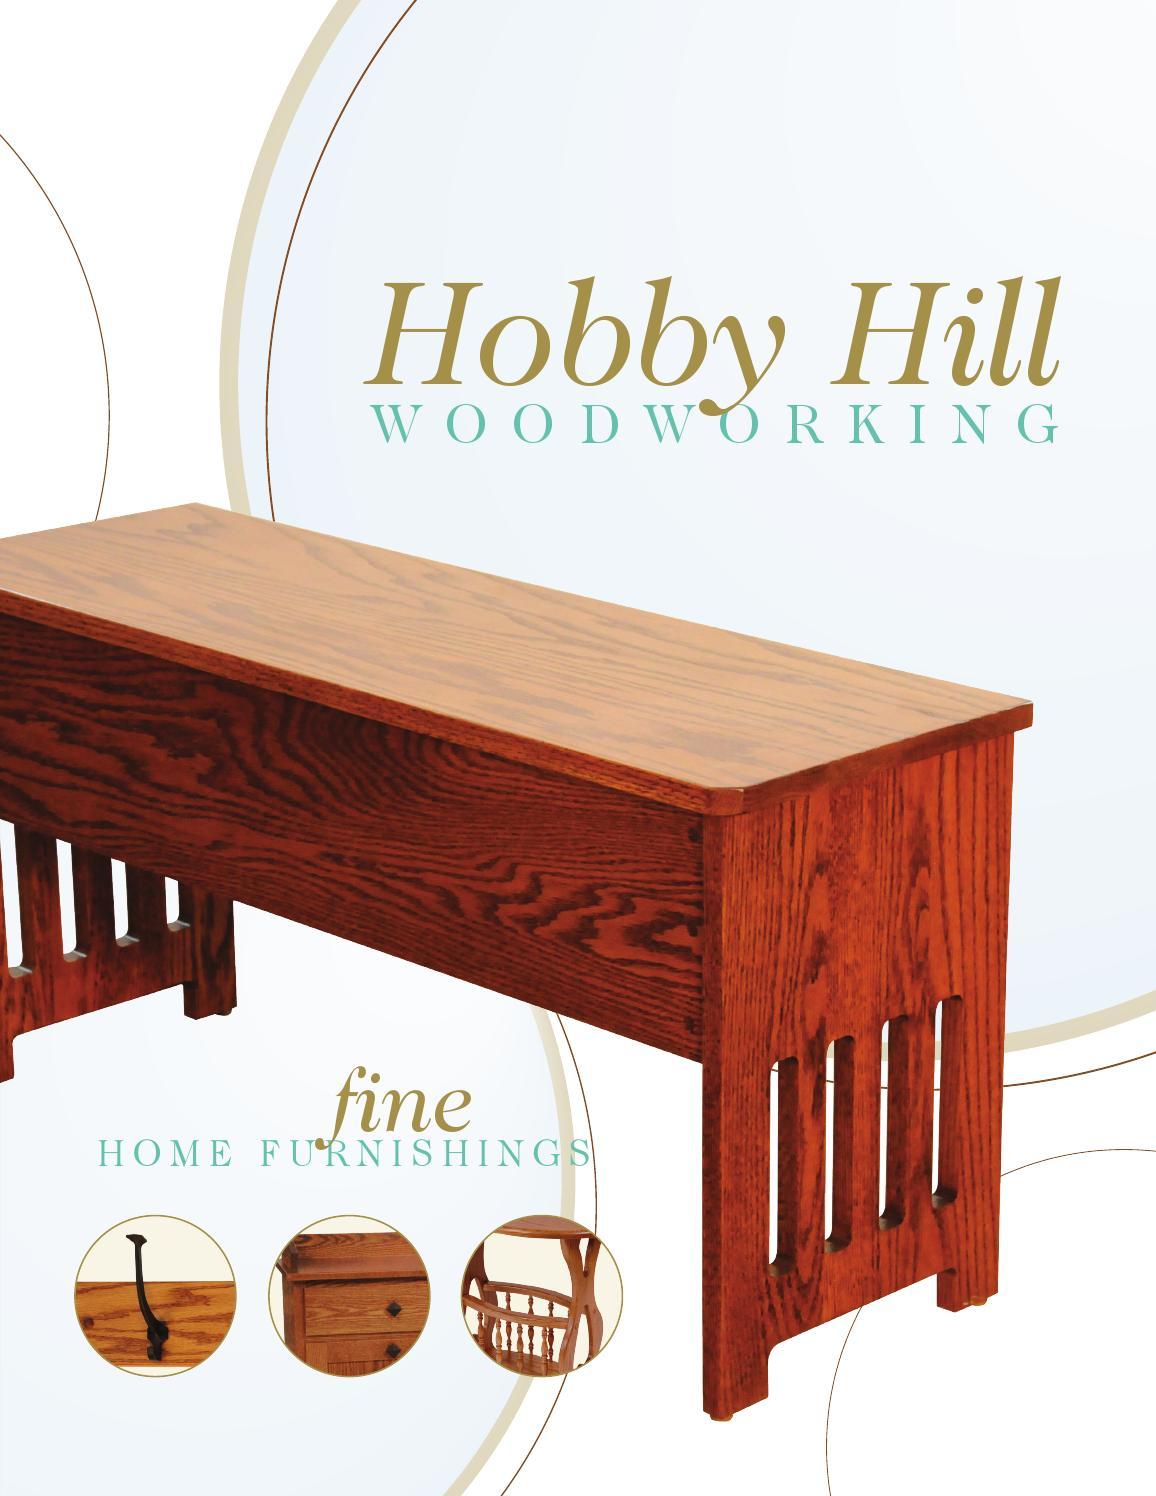 2014 Hobby Hill Woodworking Catalog / Home Furnishings / E ...